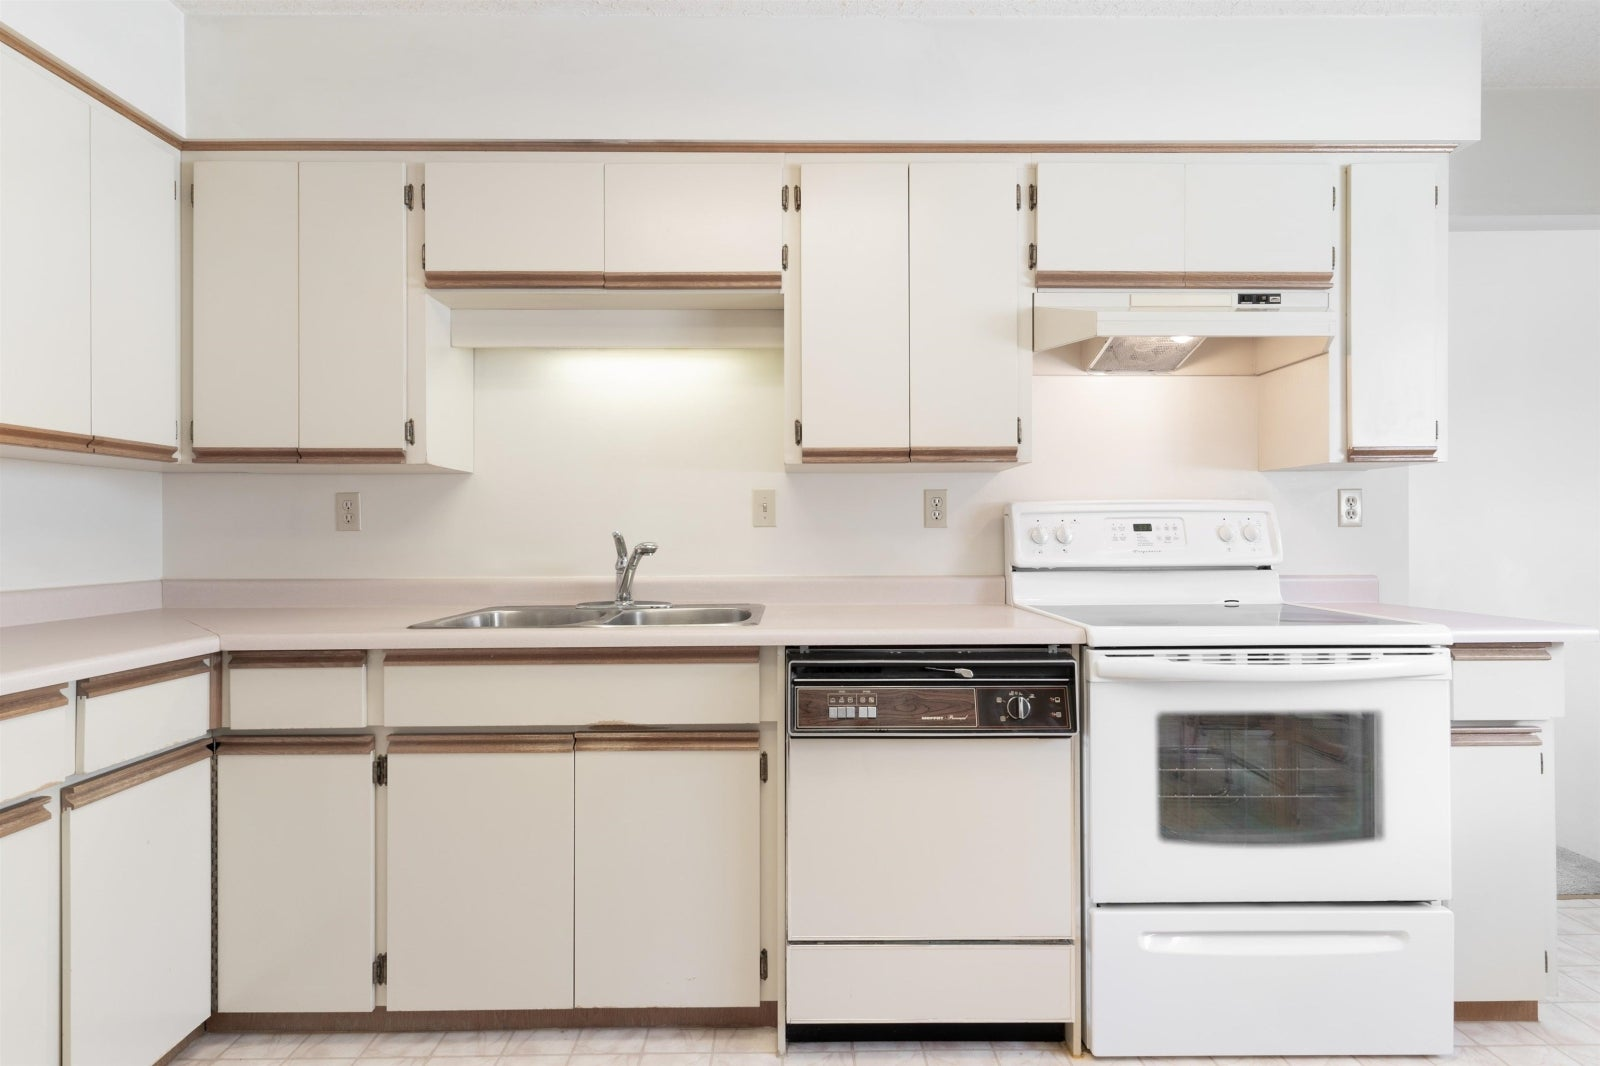 2556 RAVEN COURT - Eagle Ridge CQ House/Single Family for sale, 4 Bedrooms (R2611826) #16